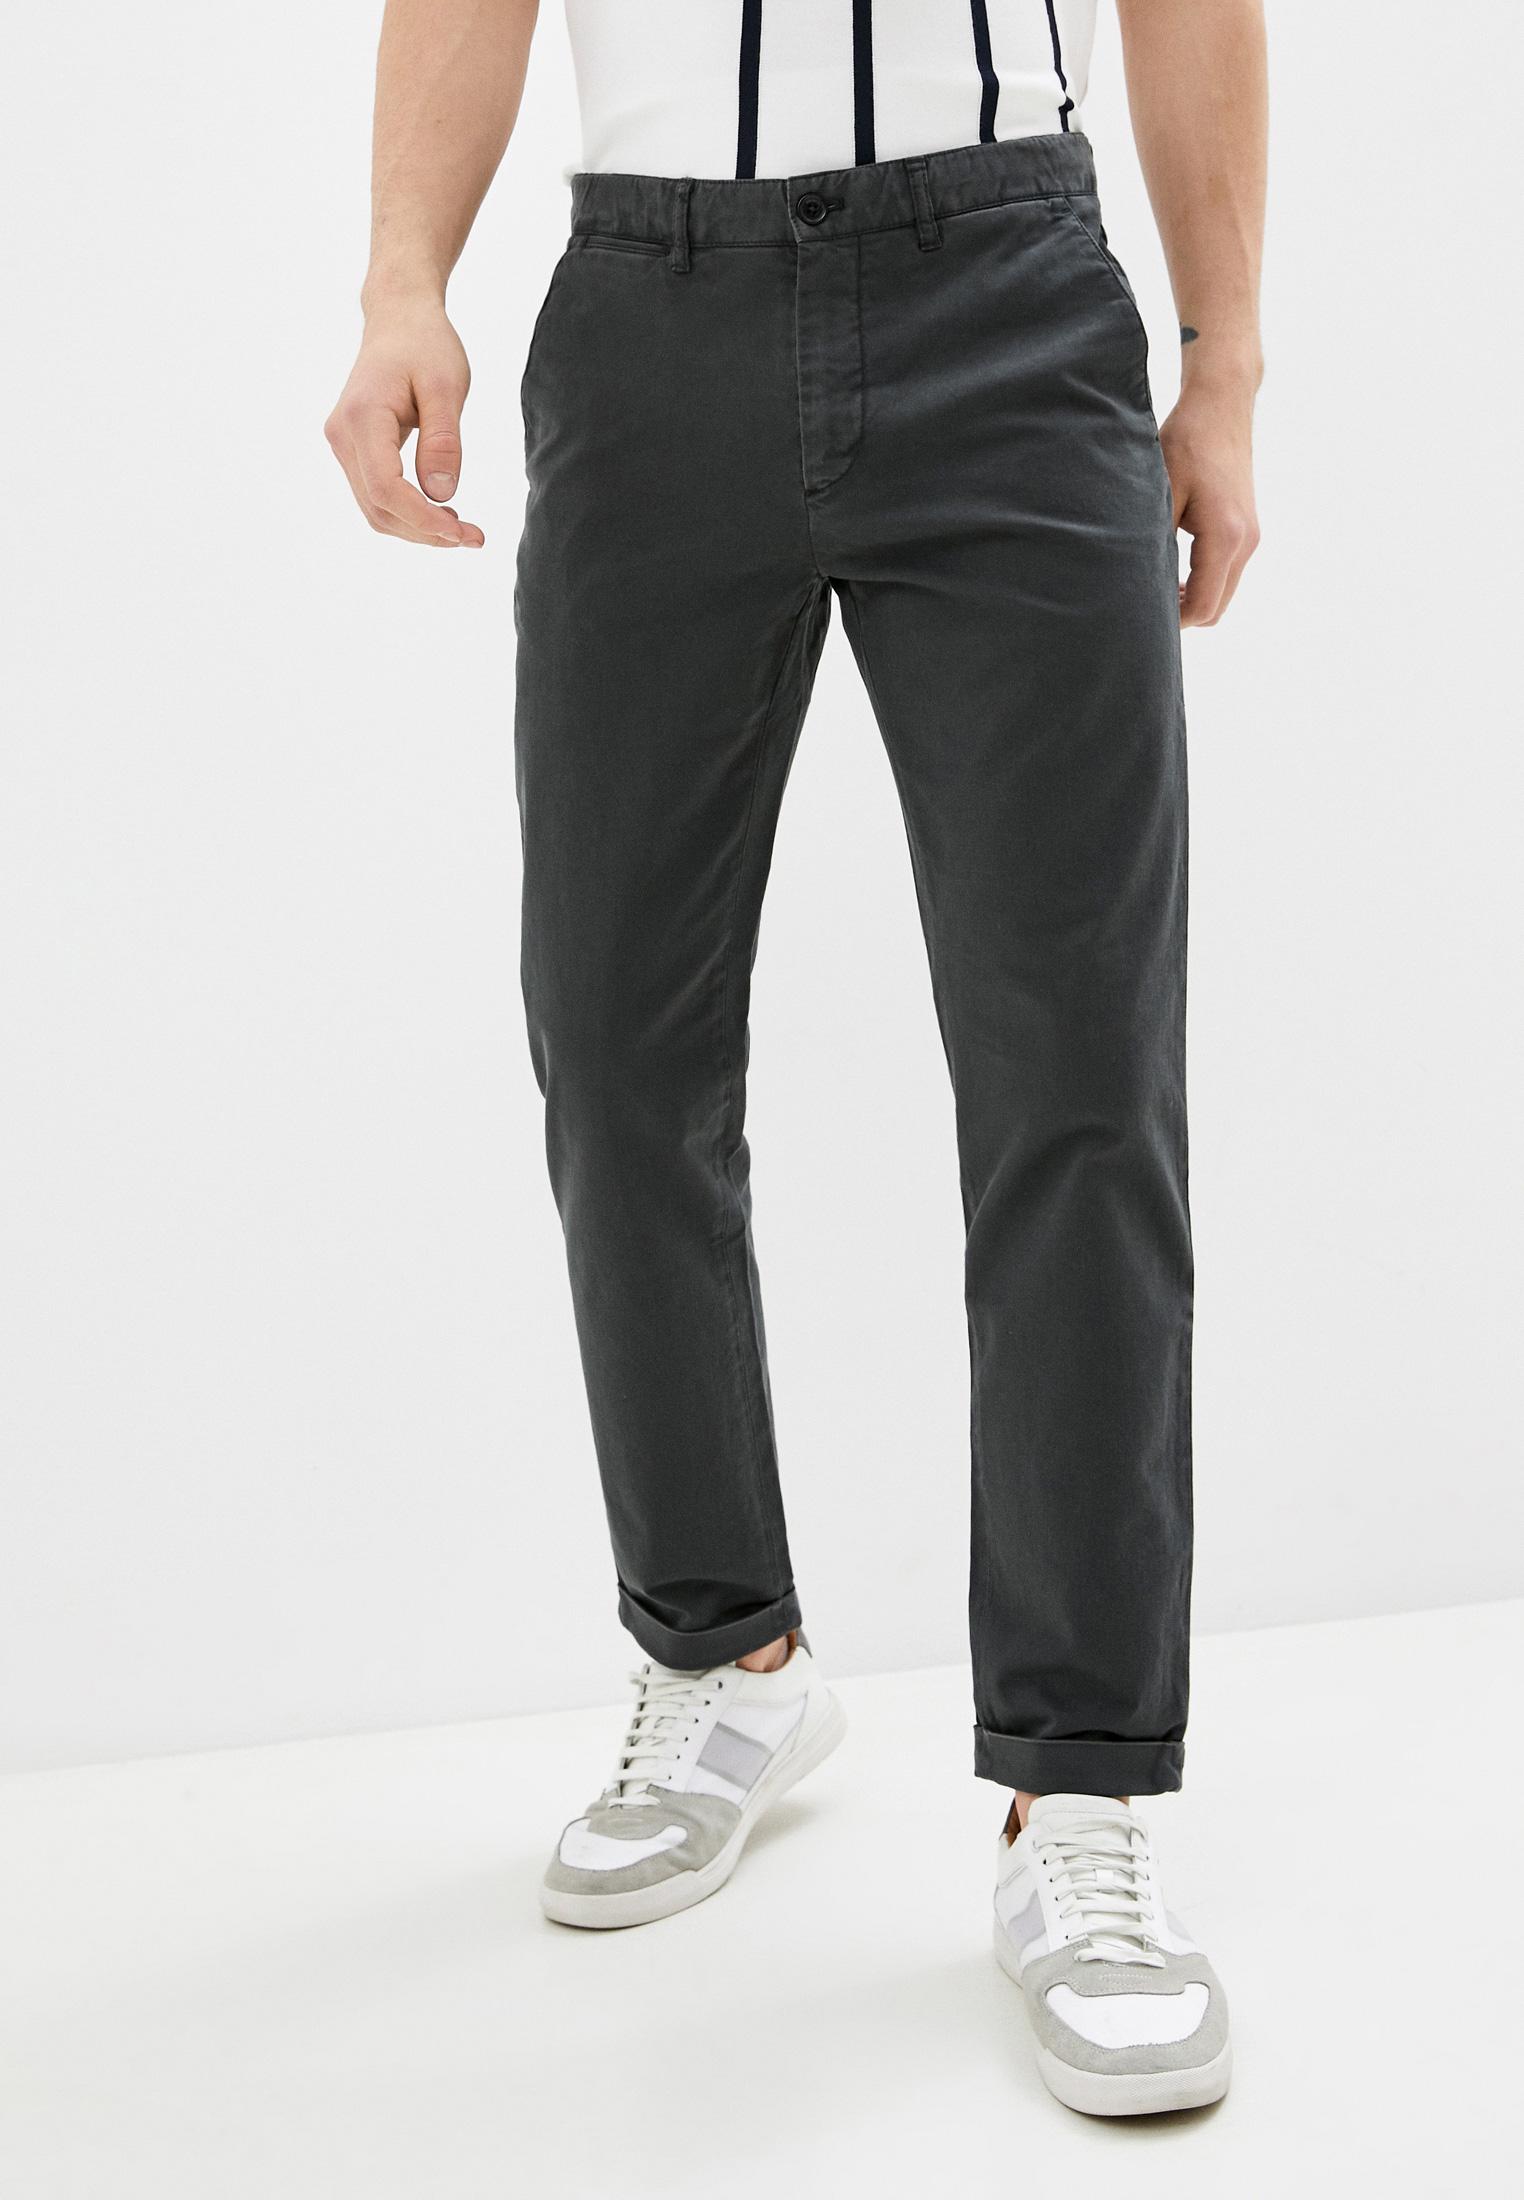 Мужские повседневные брюки Bikkembergs (Биккембергс) CP11BGDSB134